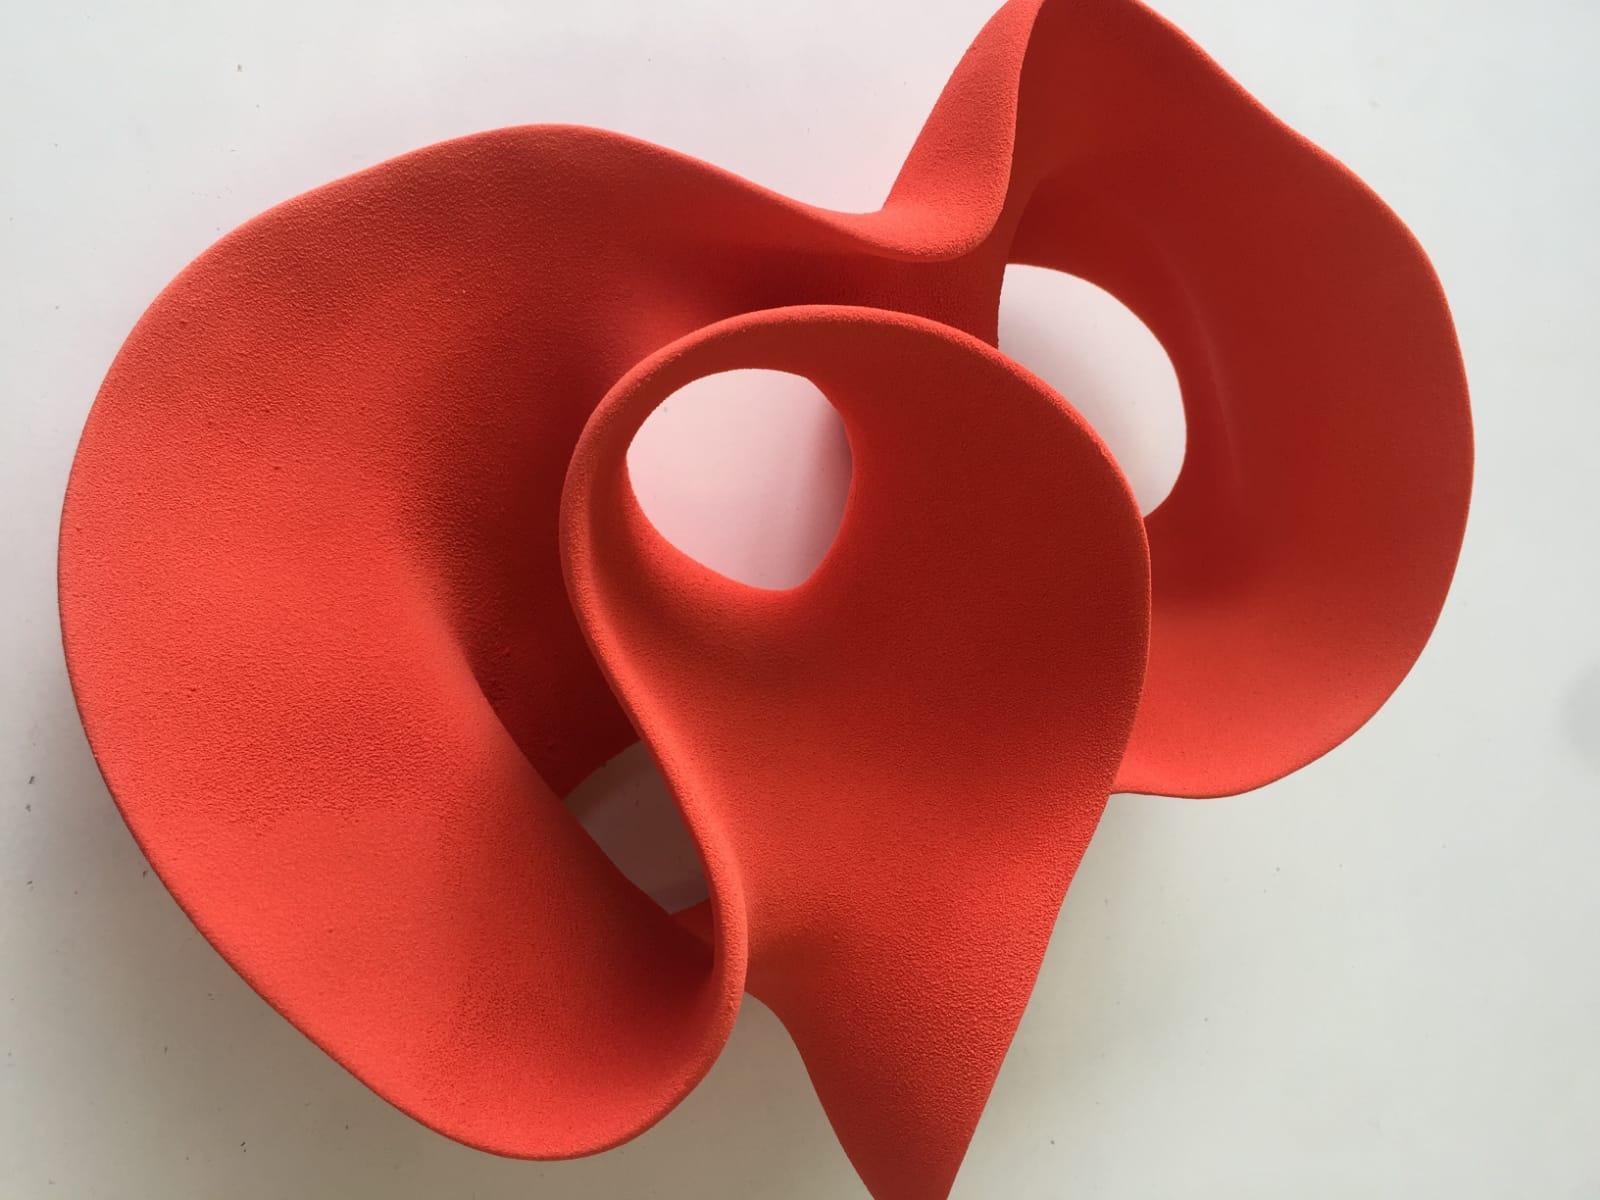 Sculptuur zomerexpositie Sille Gallery Liliane Demeester